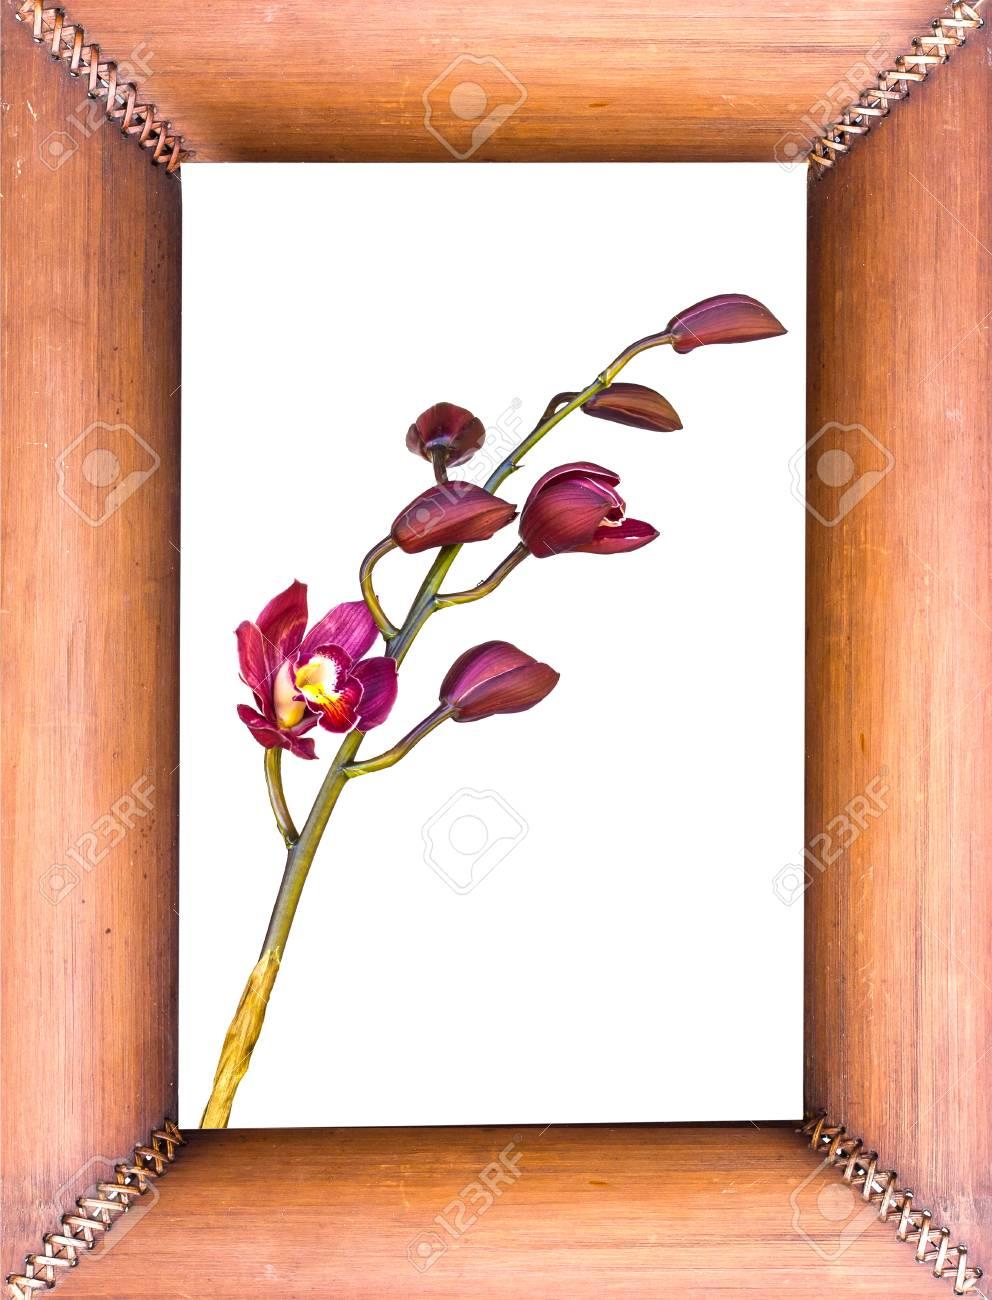 Schöne Purpurrote Blume Cymbidium Orchidee In Bambus-Rahmen ...